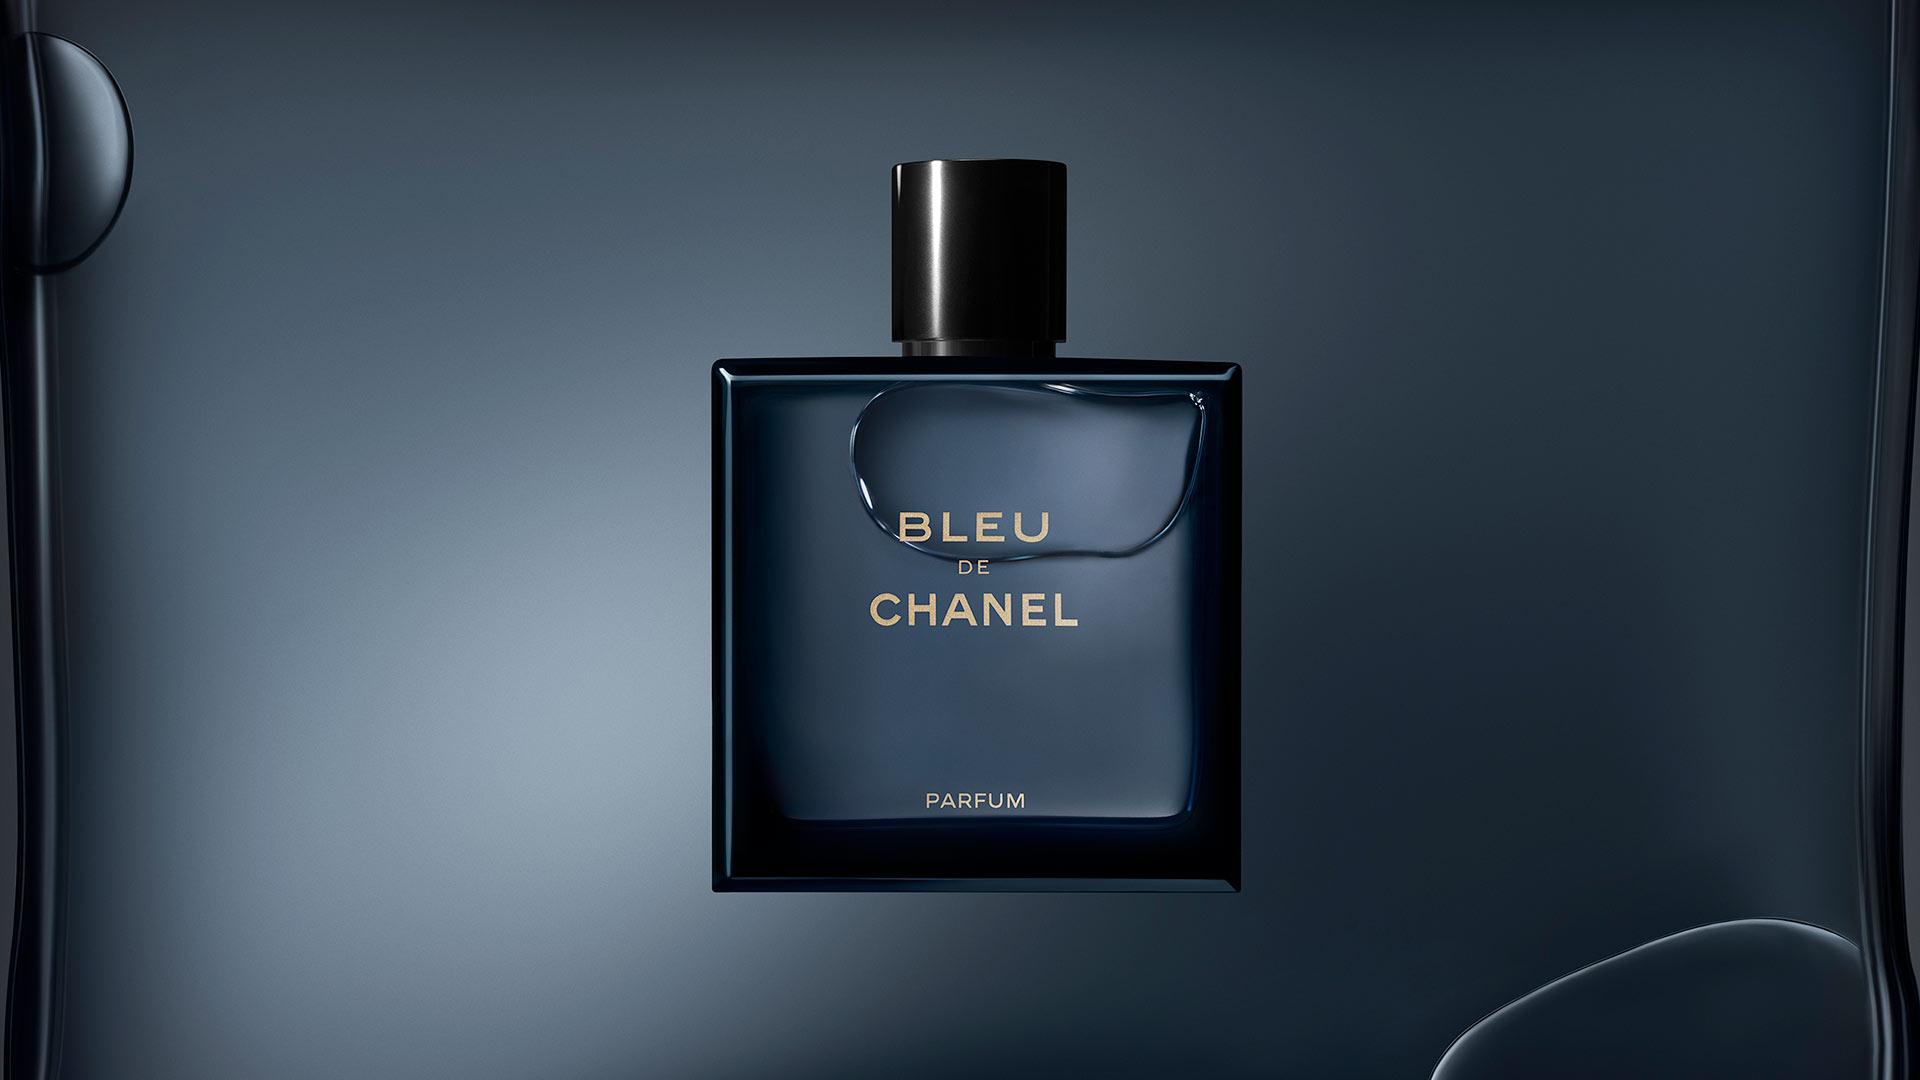 a1e4bd3a3 Bleu de Chanel Parfum Chanel colônia - a novo fragrância Masculino 2018